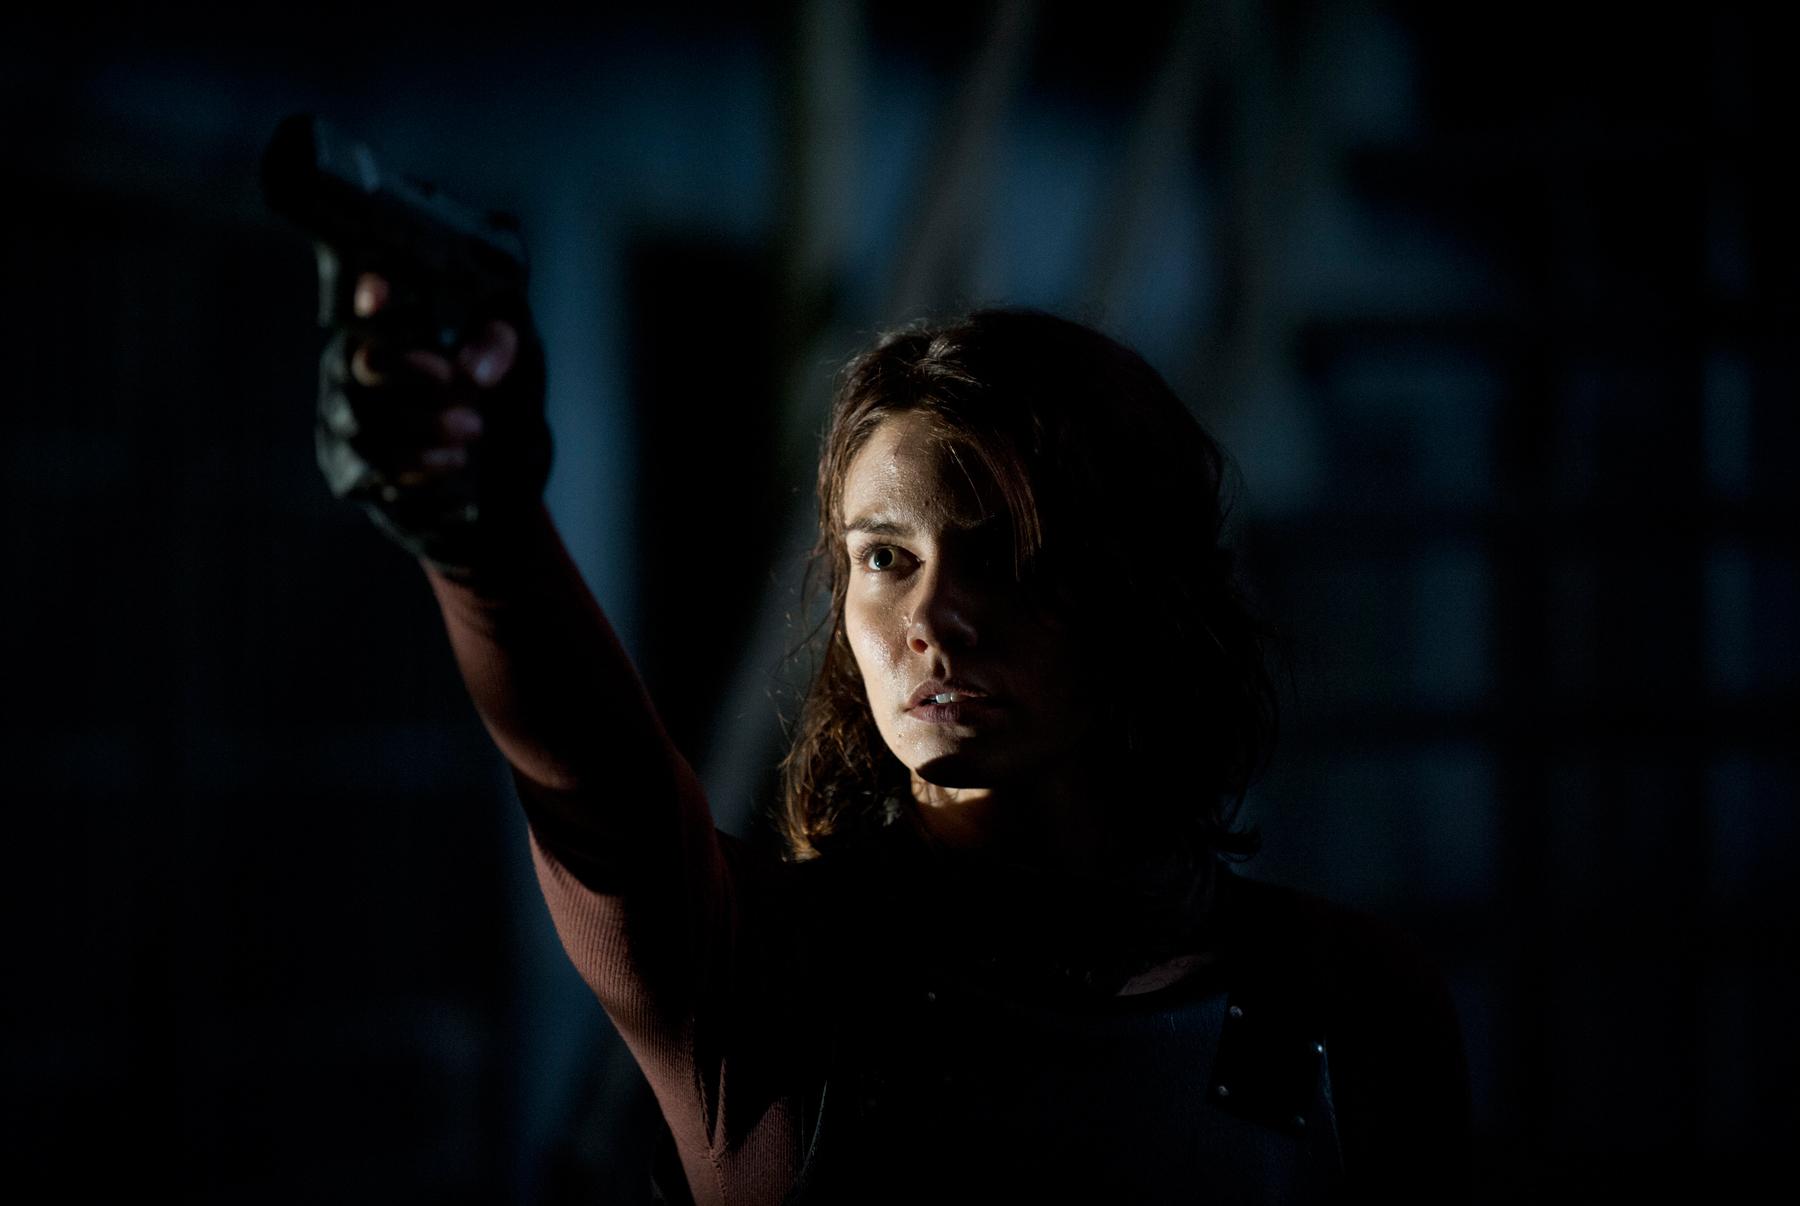 'The Walking Dead': Lauren Cohan to Return to Zombie Series in Season 11